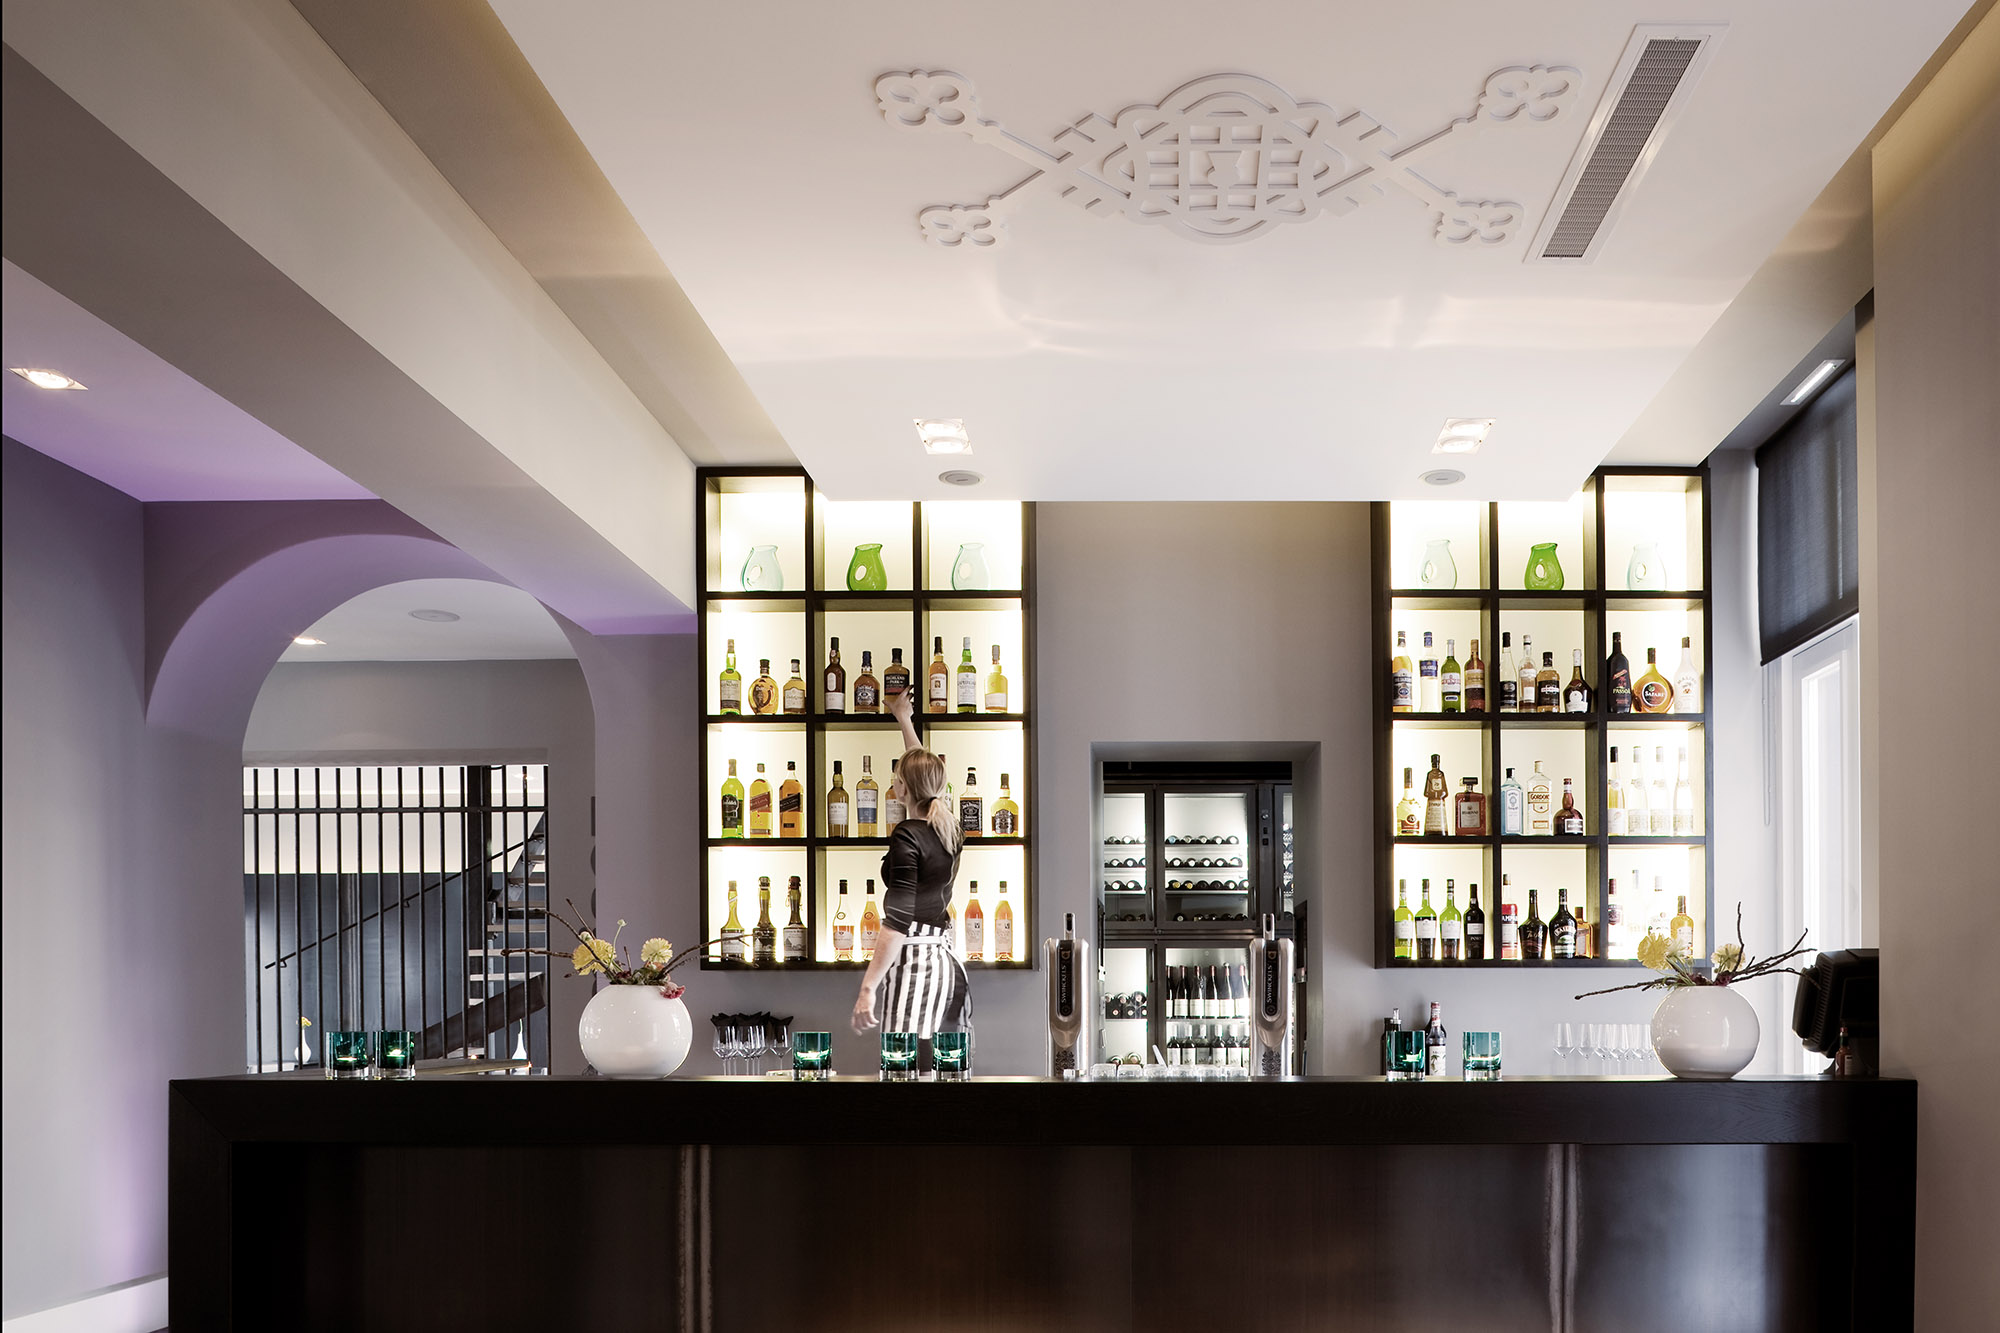 SPUISERS arresthuis roermond bar restaurant damianz